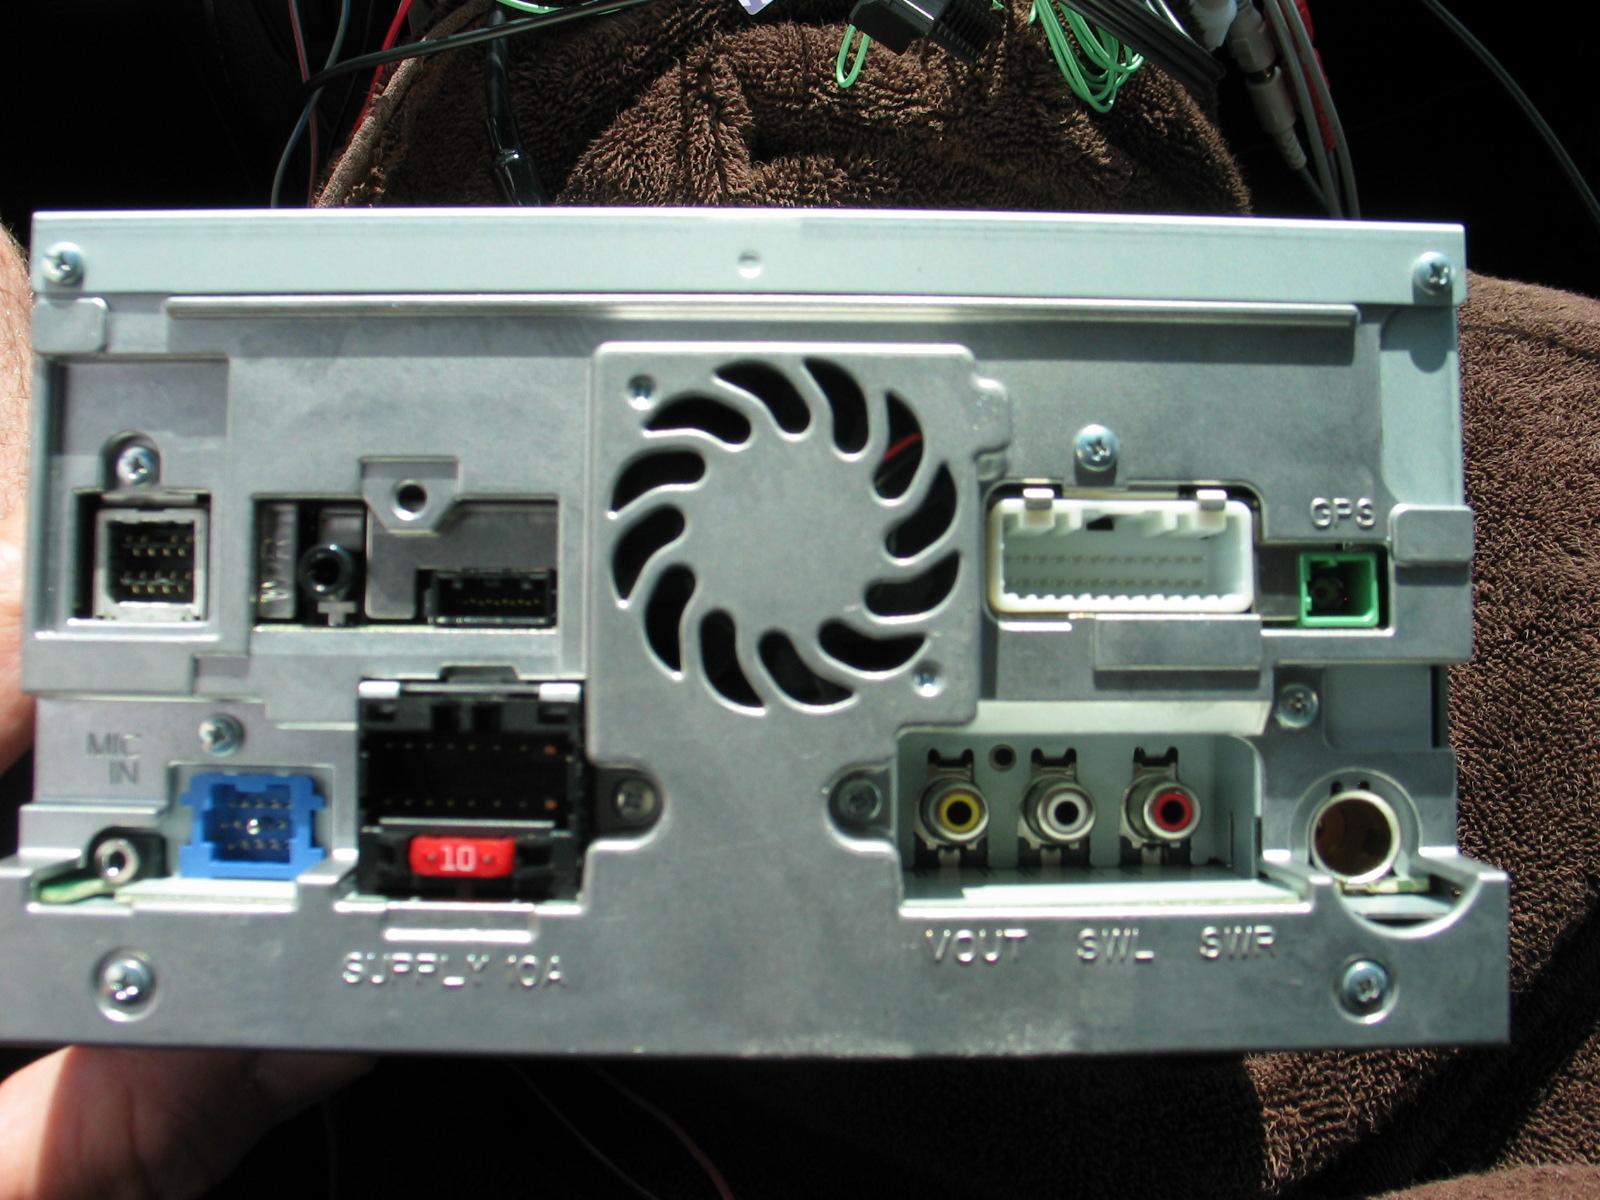 installing a pioneer avic x9310bt hu nd bc6 rearview cam in base rh subaruoutback org pioneer avic-x9310bt manual Pioneer AVIC -X930BT Manual